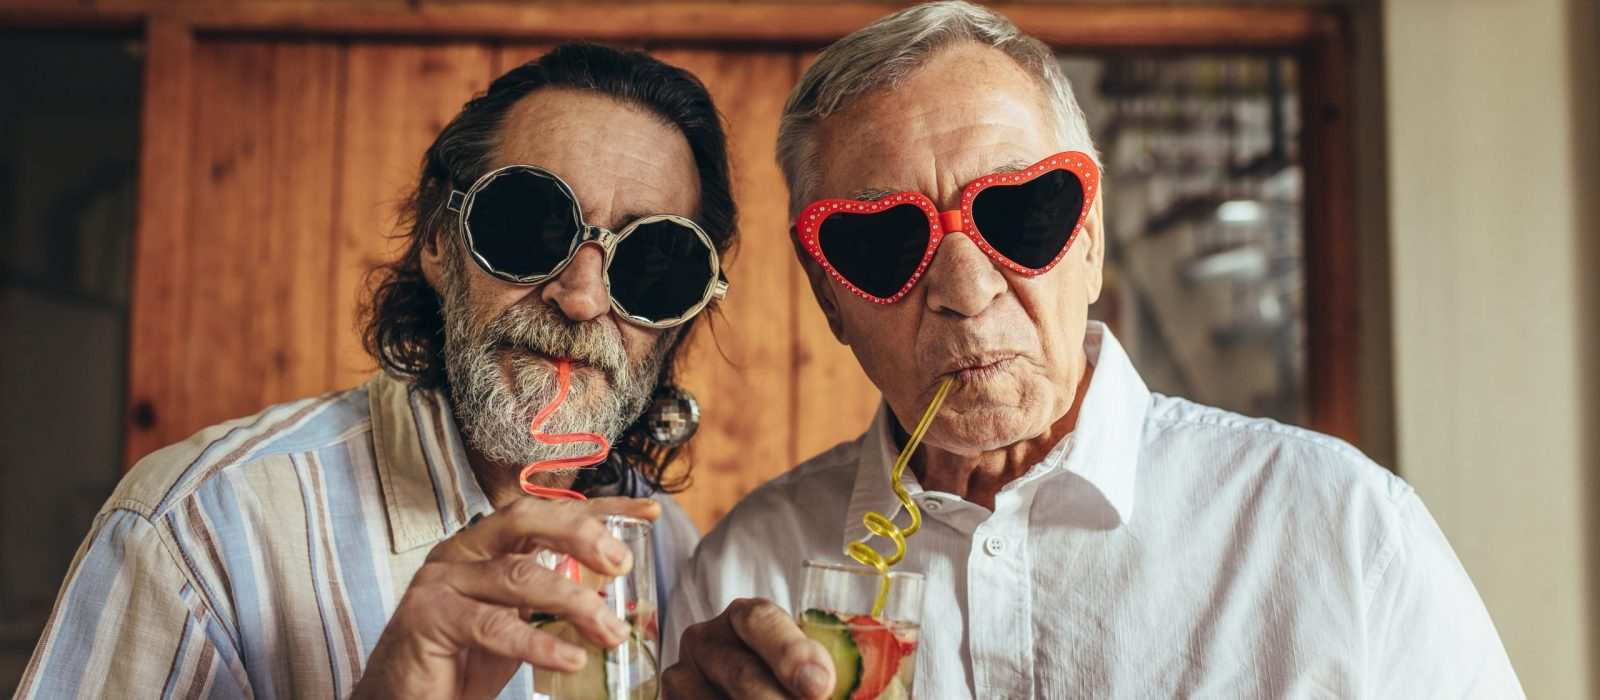 Senior men wearing funny sunglasses drinking juice with straw. Elderly friends with crazy eyewear having juice indoors.